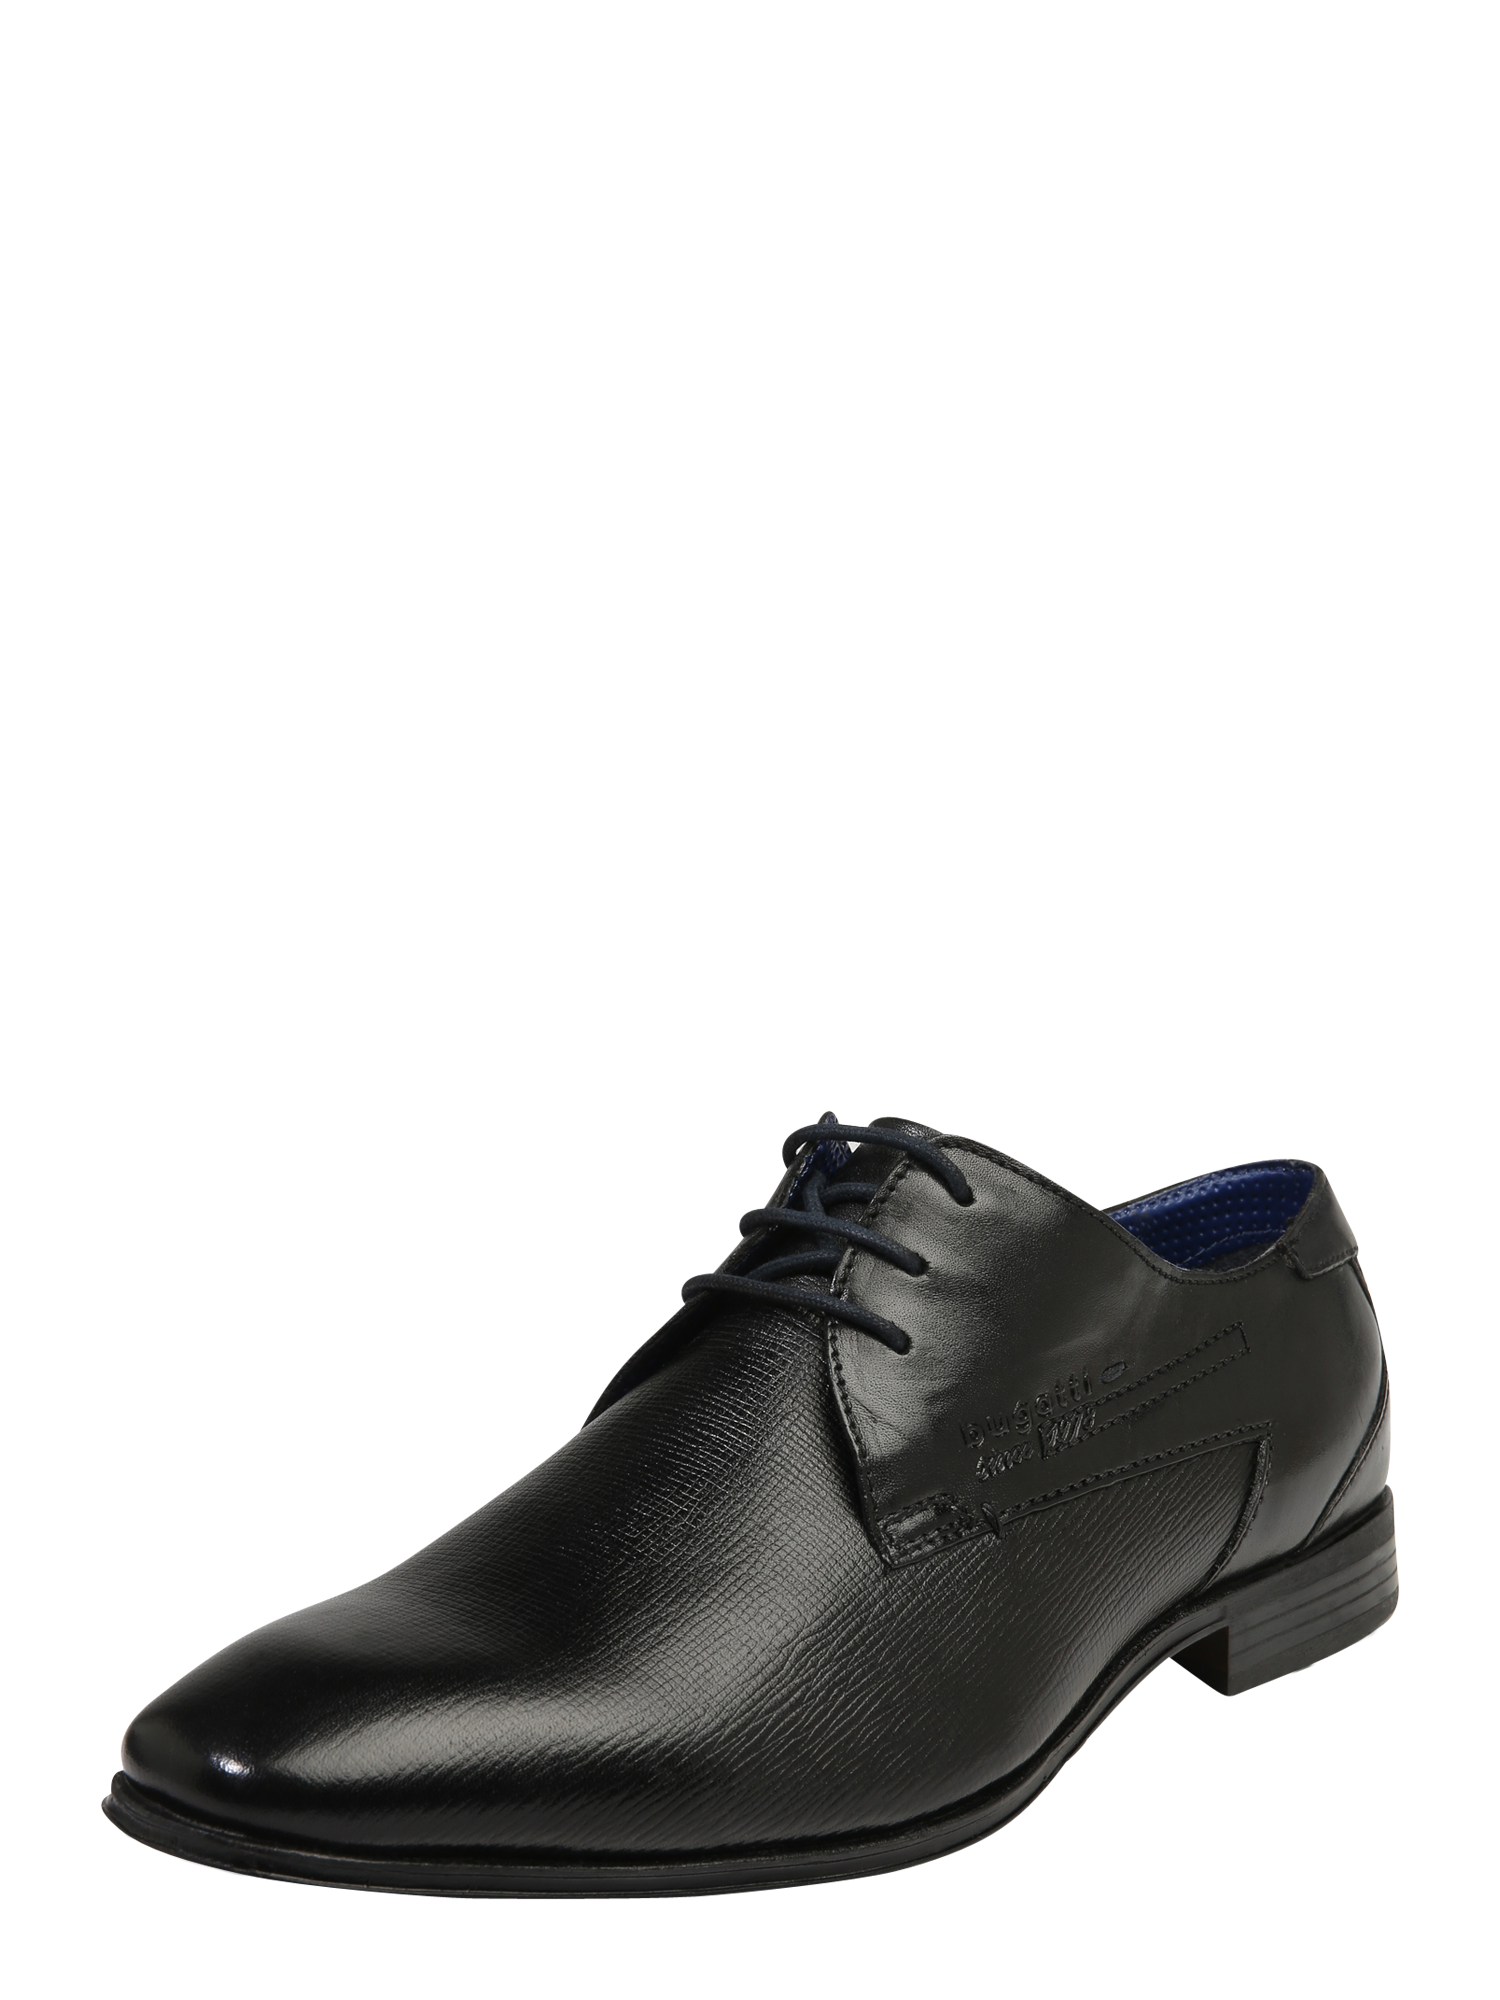 Business Schuhe #Halbschuhe #Schnürschuhe #Schuhe #Herren